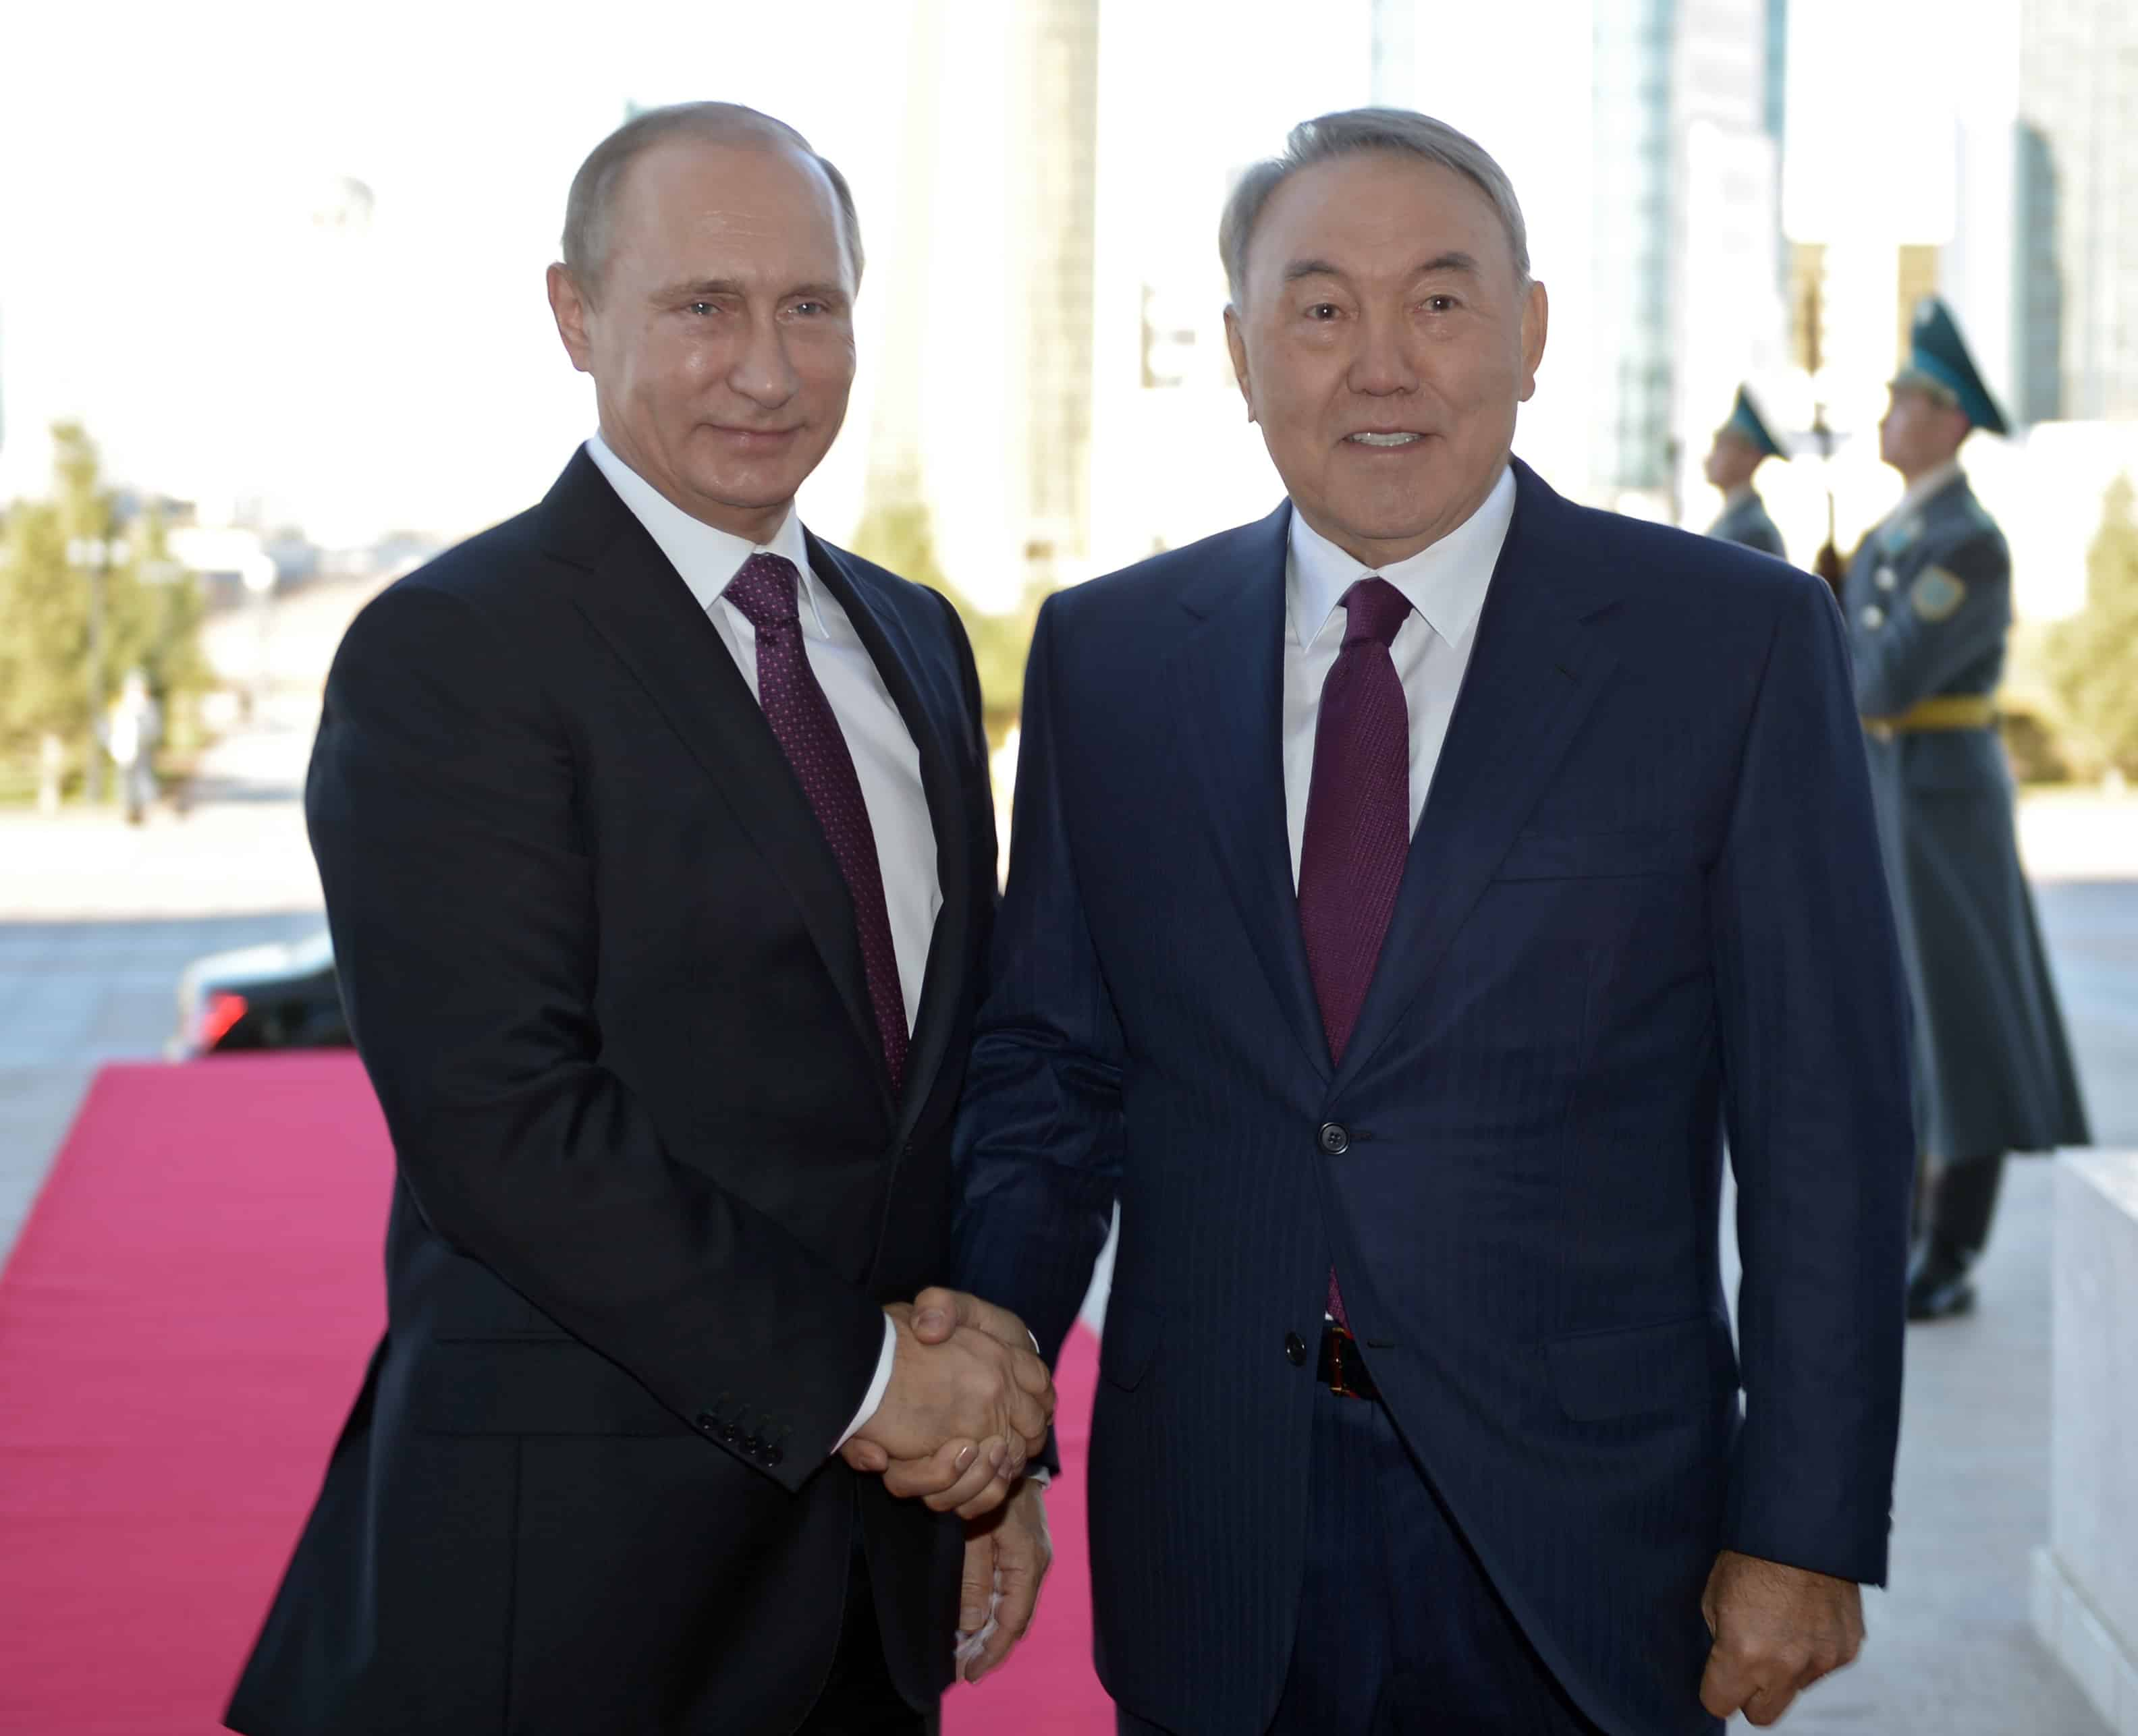 Kazakhstan President Nursultan Nazarbayev and Russian President Vladimir Putin